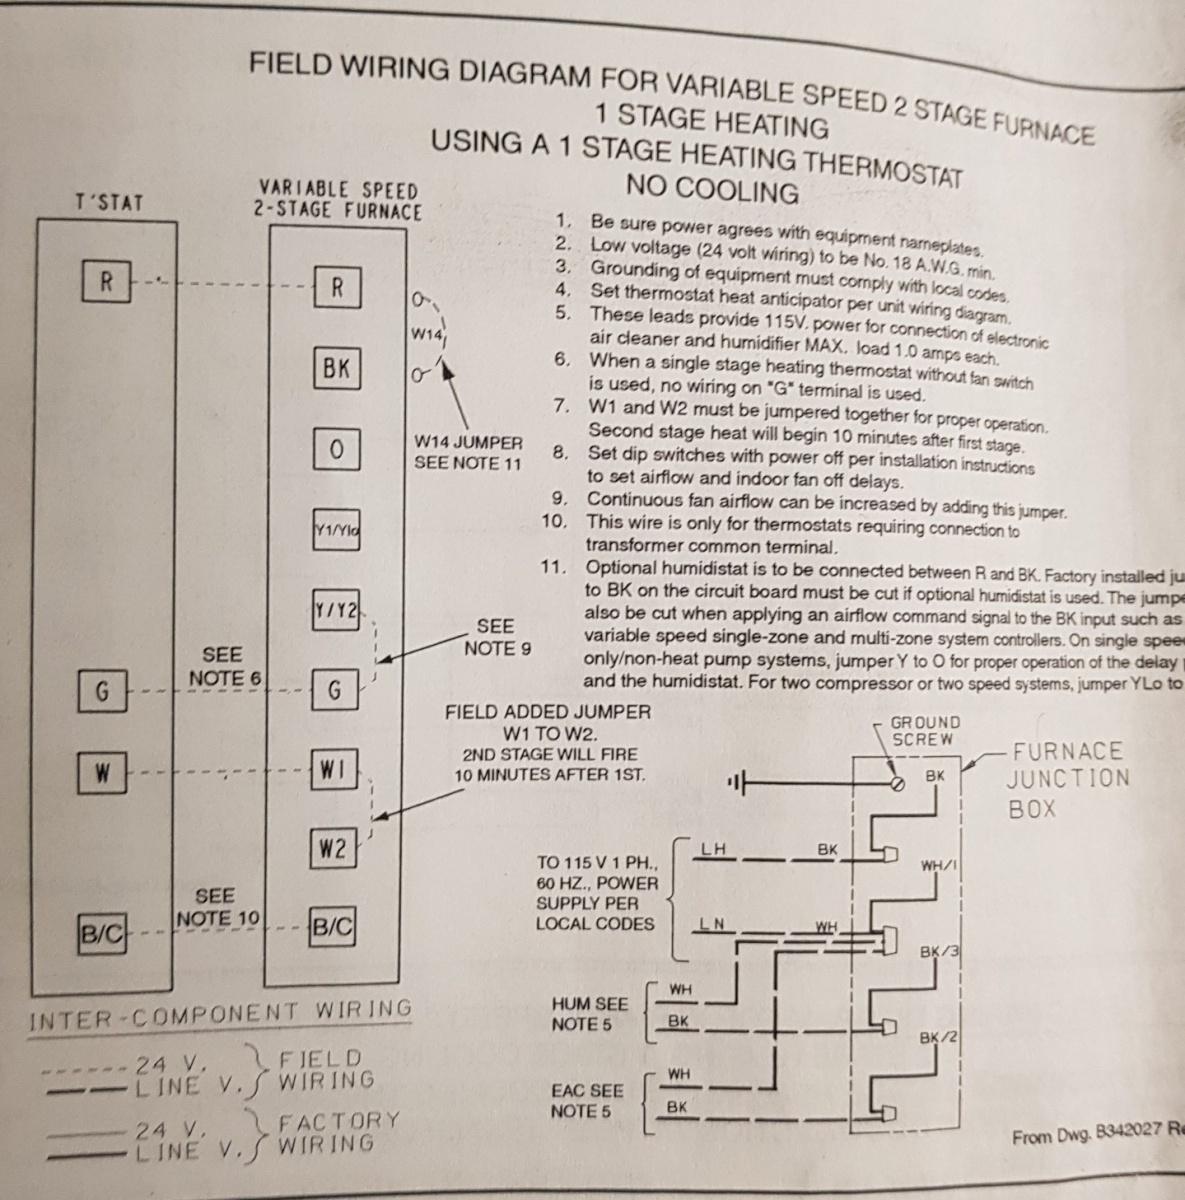 Wiring Diagrams Besides Trane Heat Air Thermostat Wiring Diagram